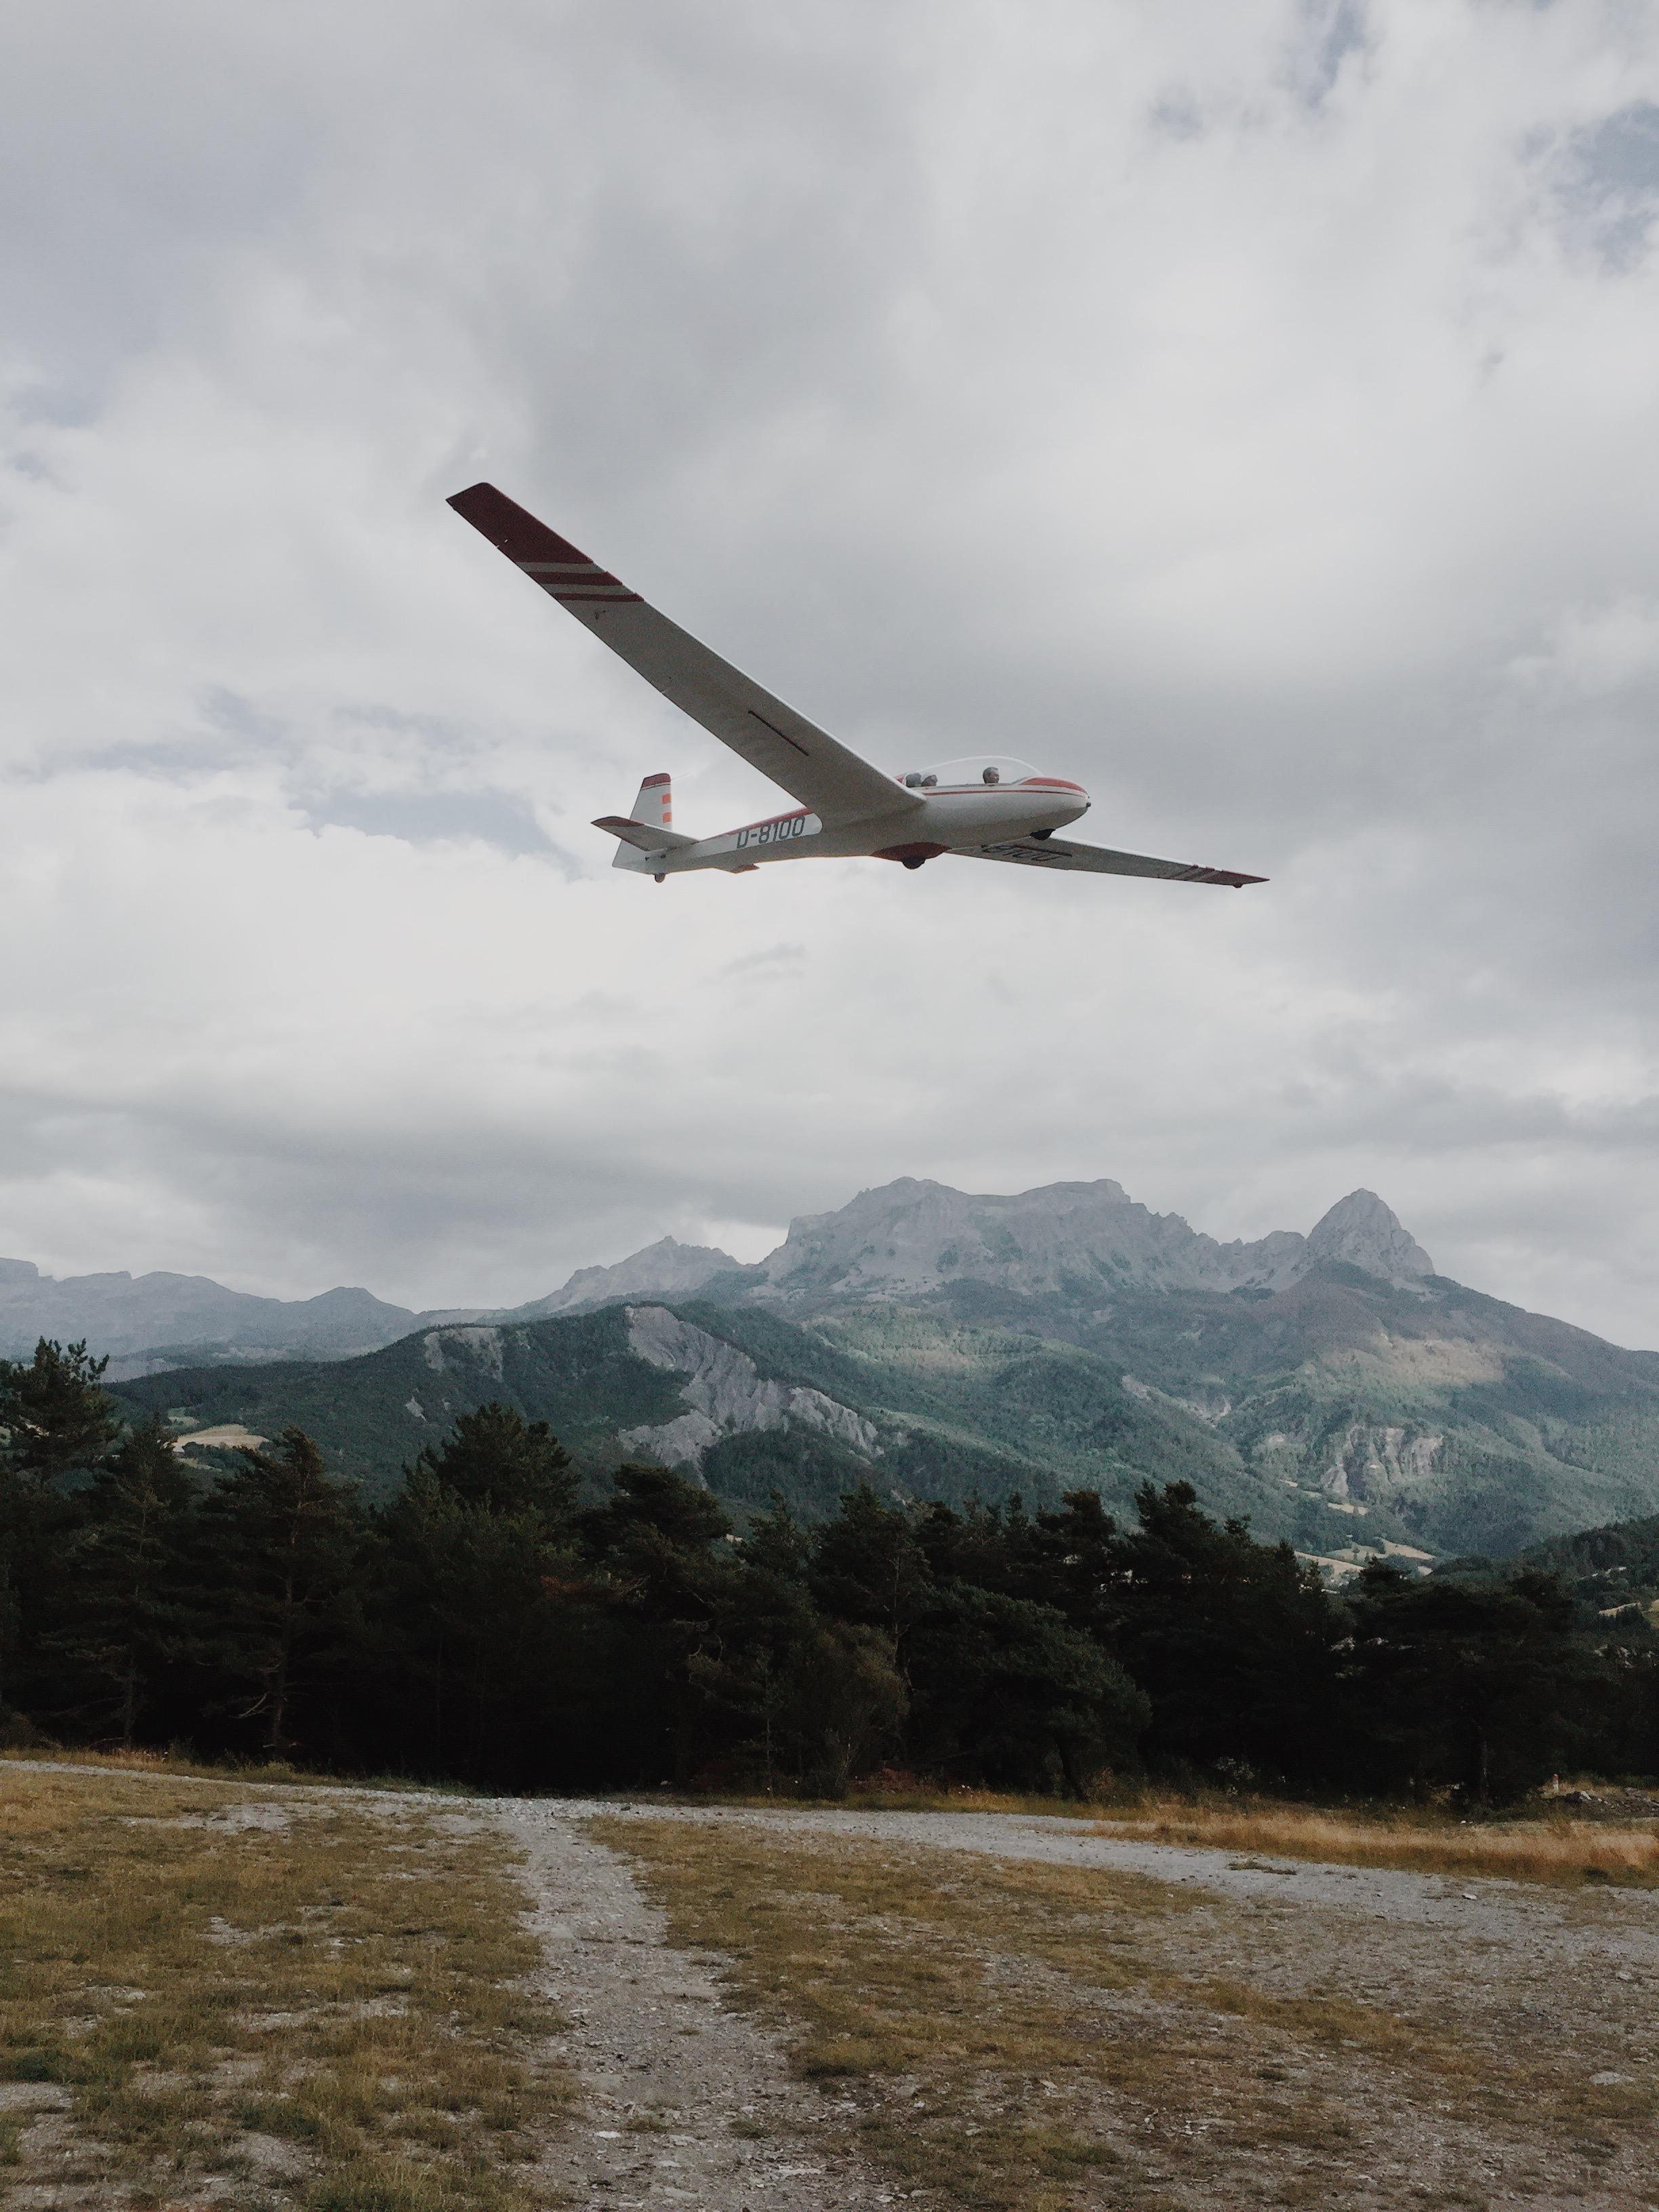 Glider plane landing at Saint-Pons Airport, Barcelonnette, France